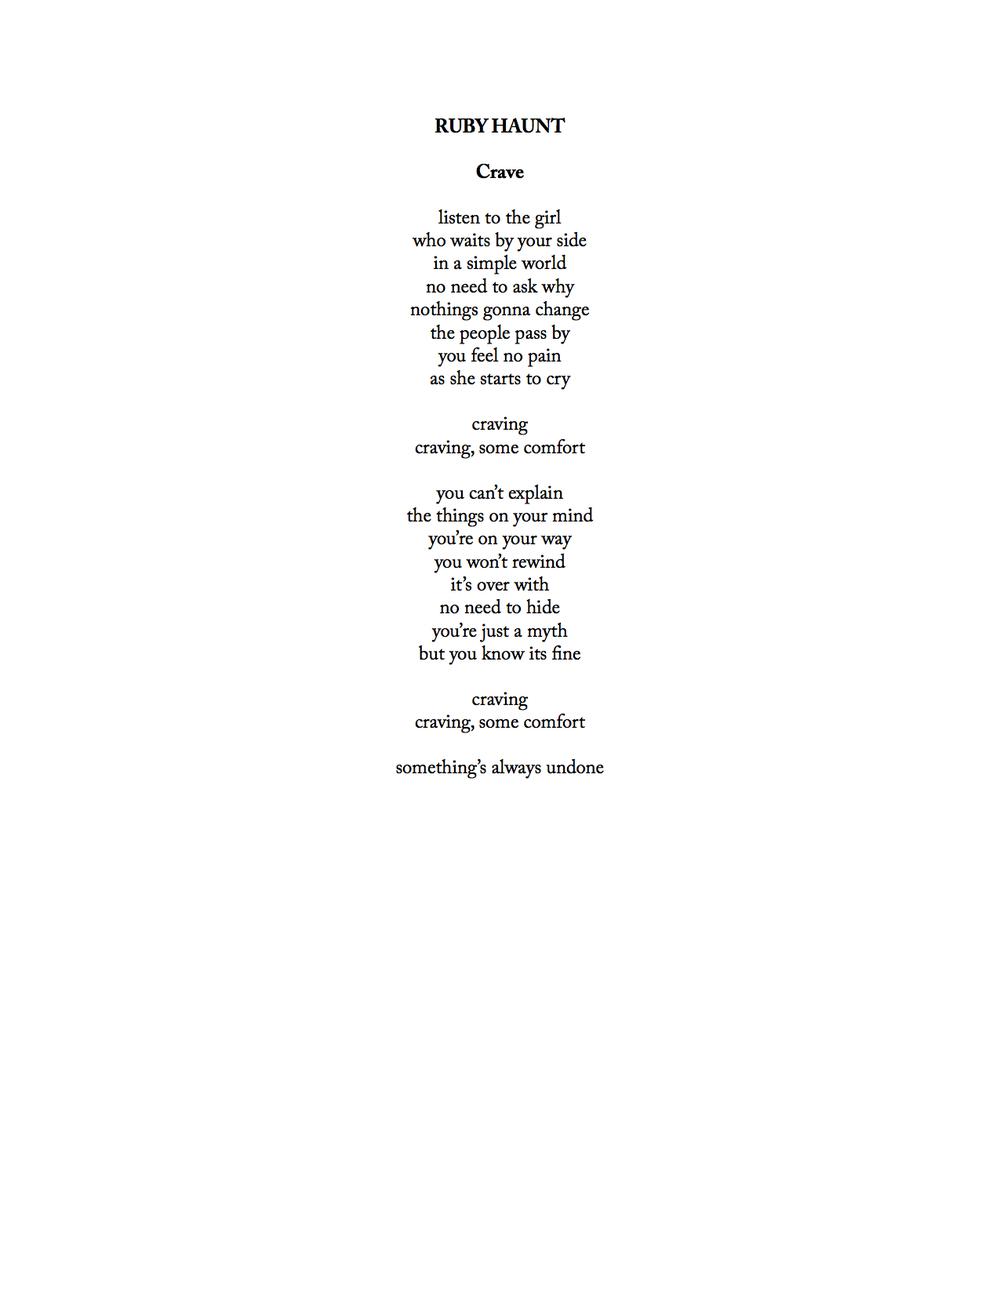 ruby haunt - crave